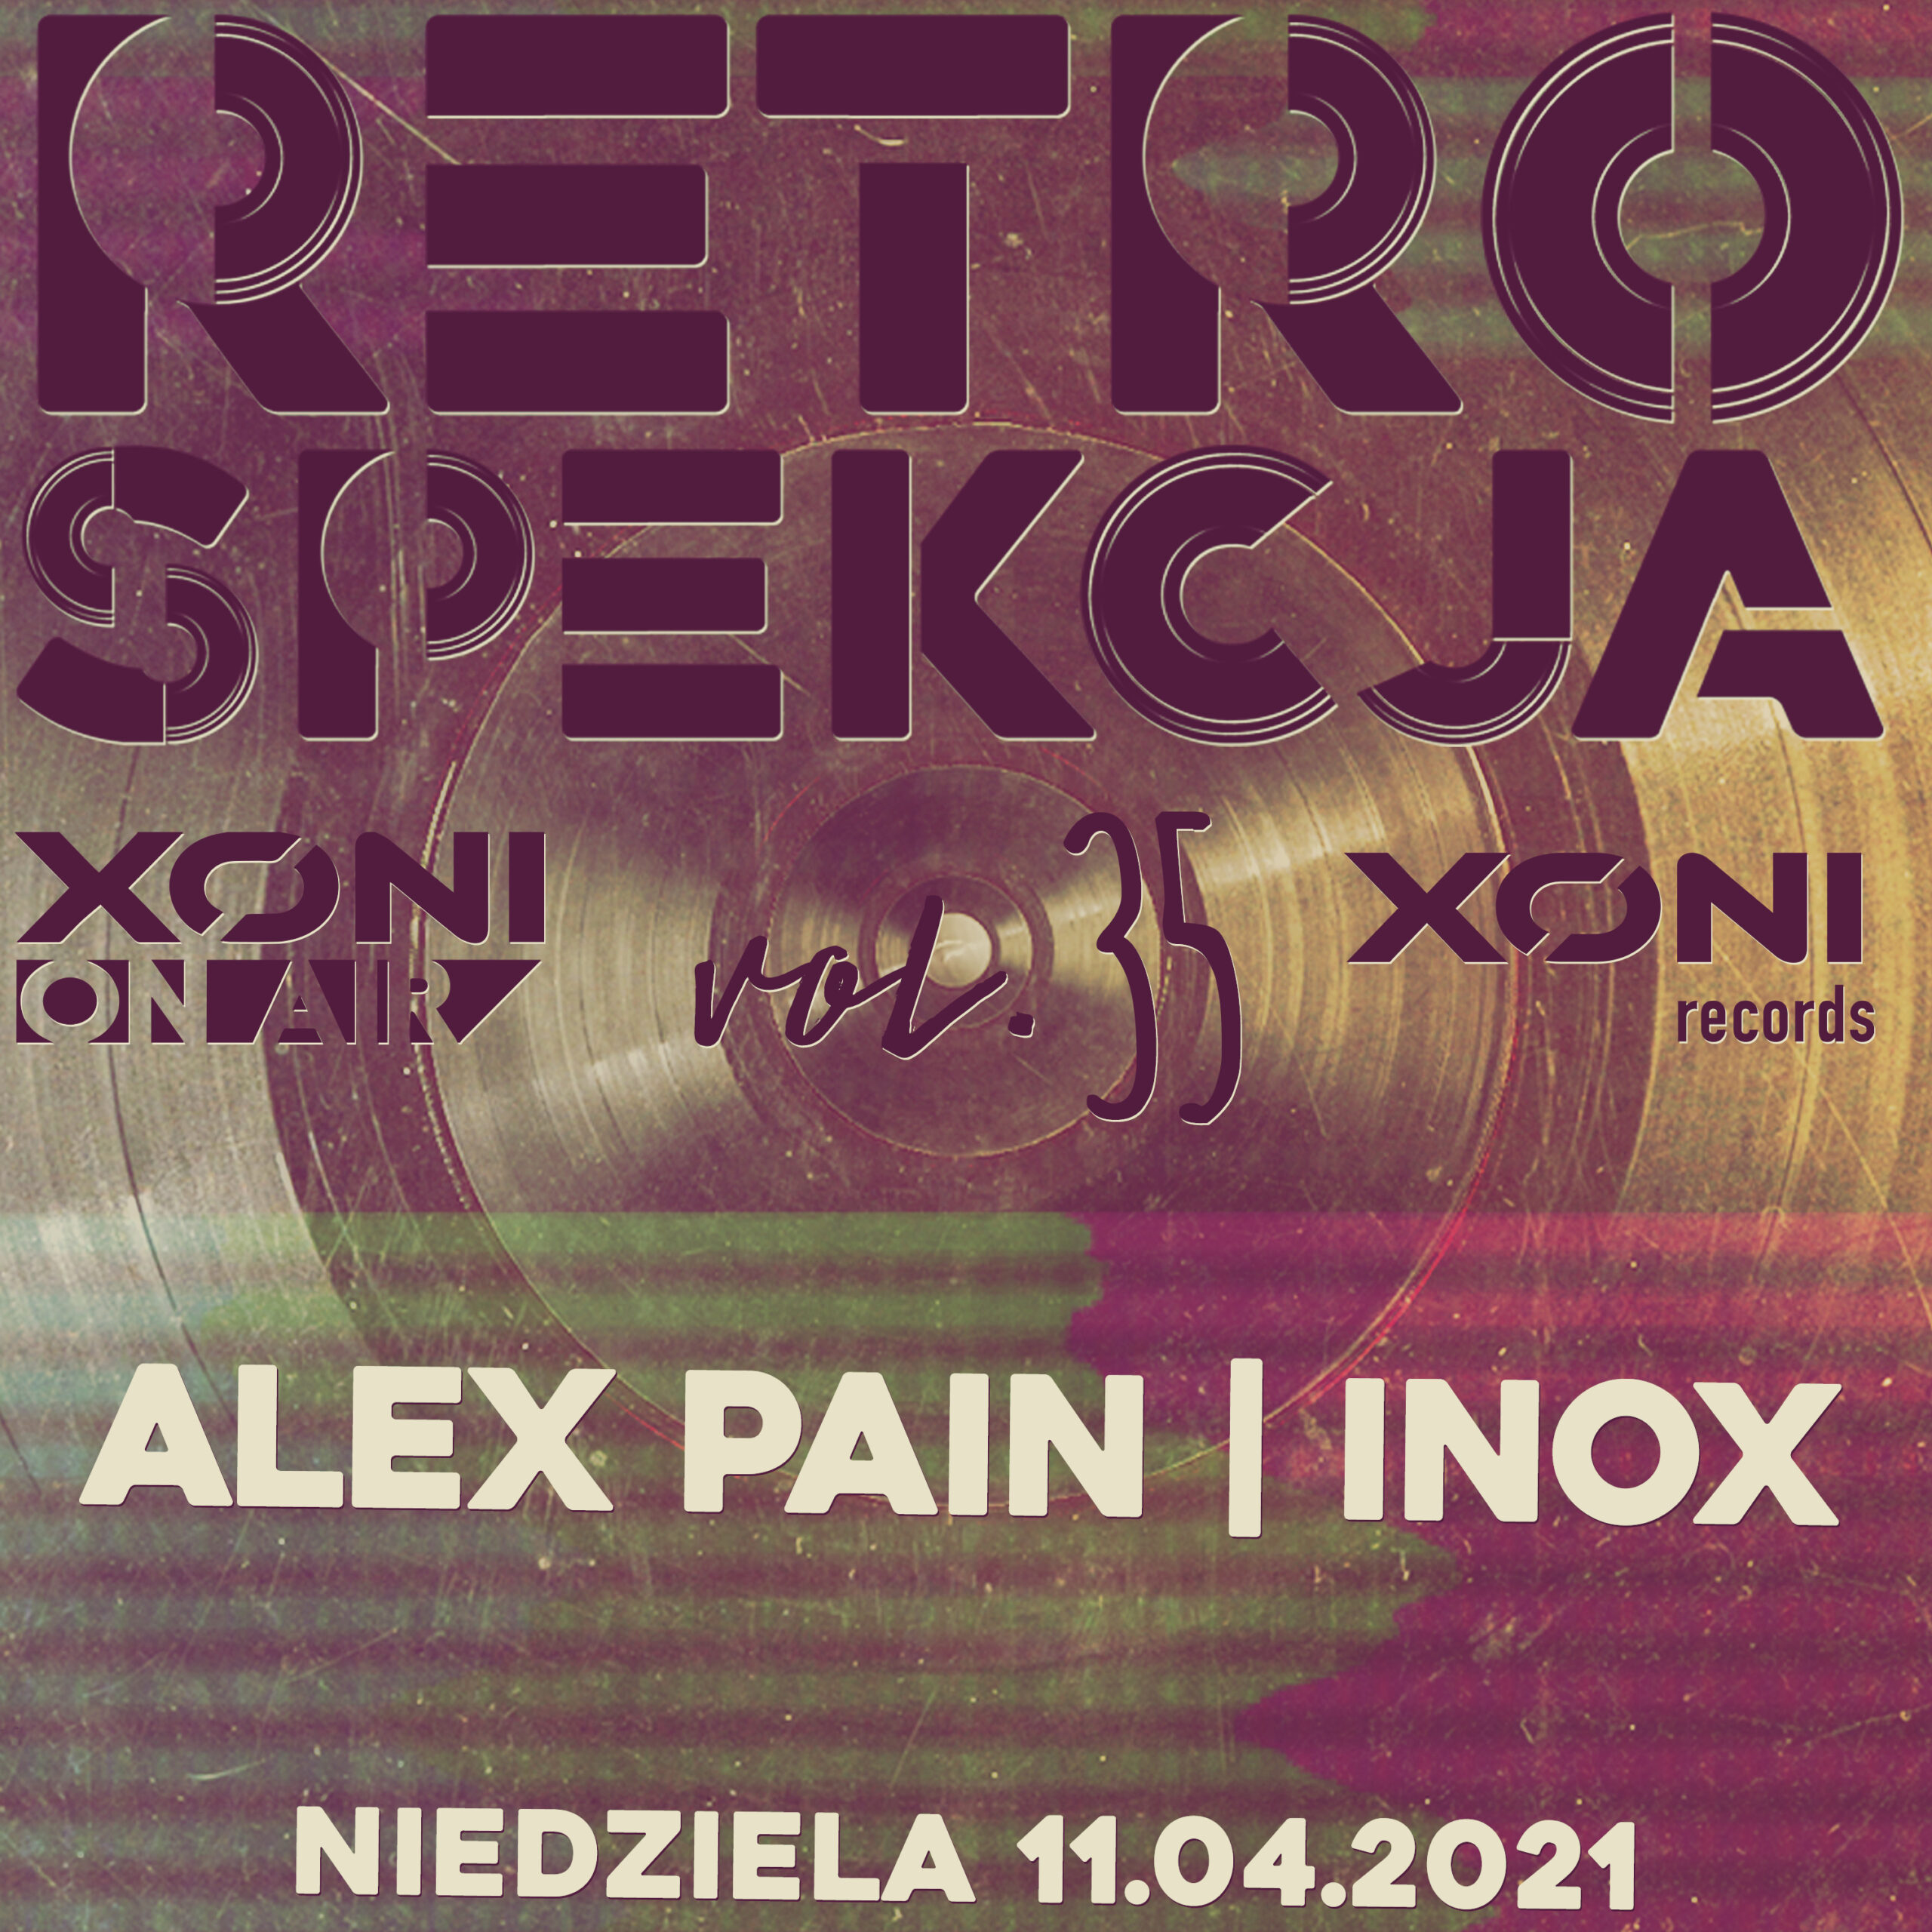 Retrospekcja Vol.35 Alex Pain/Inox